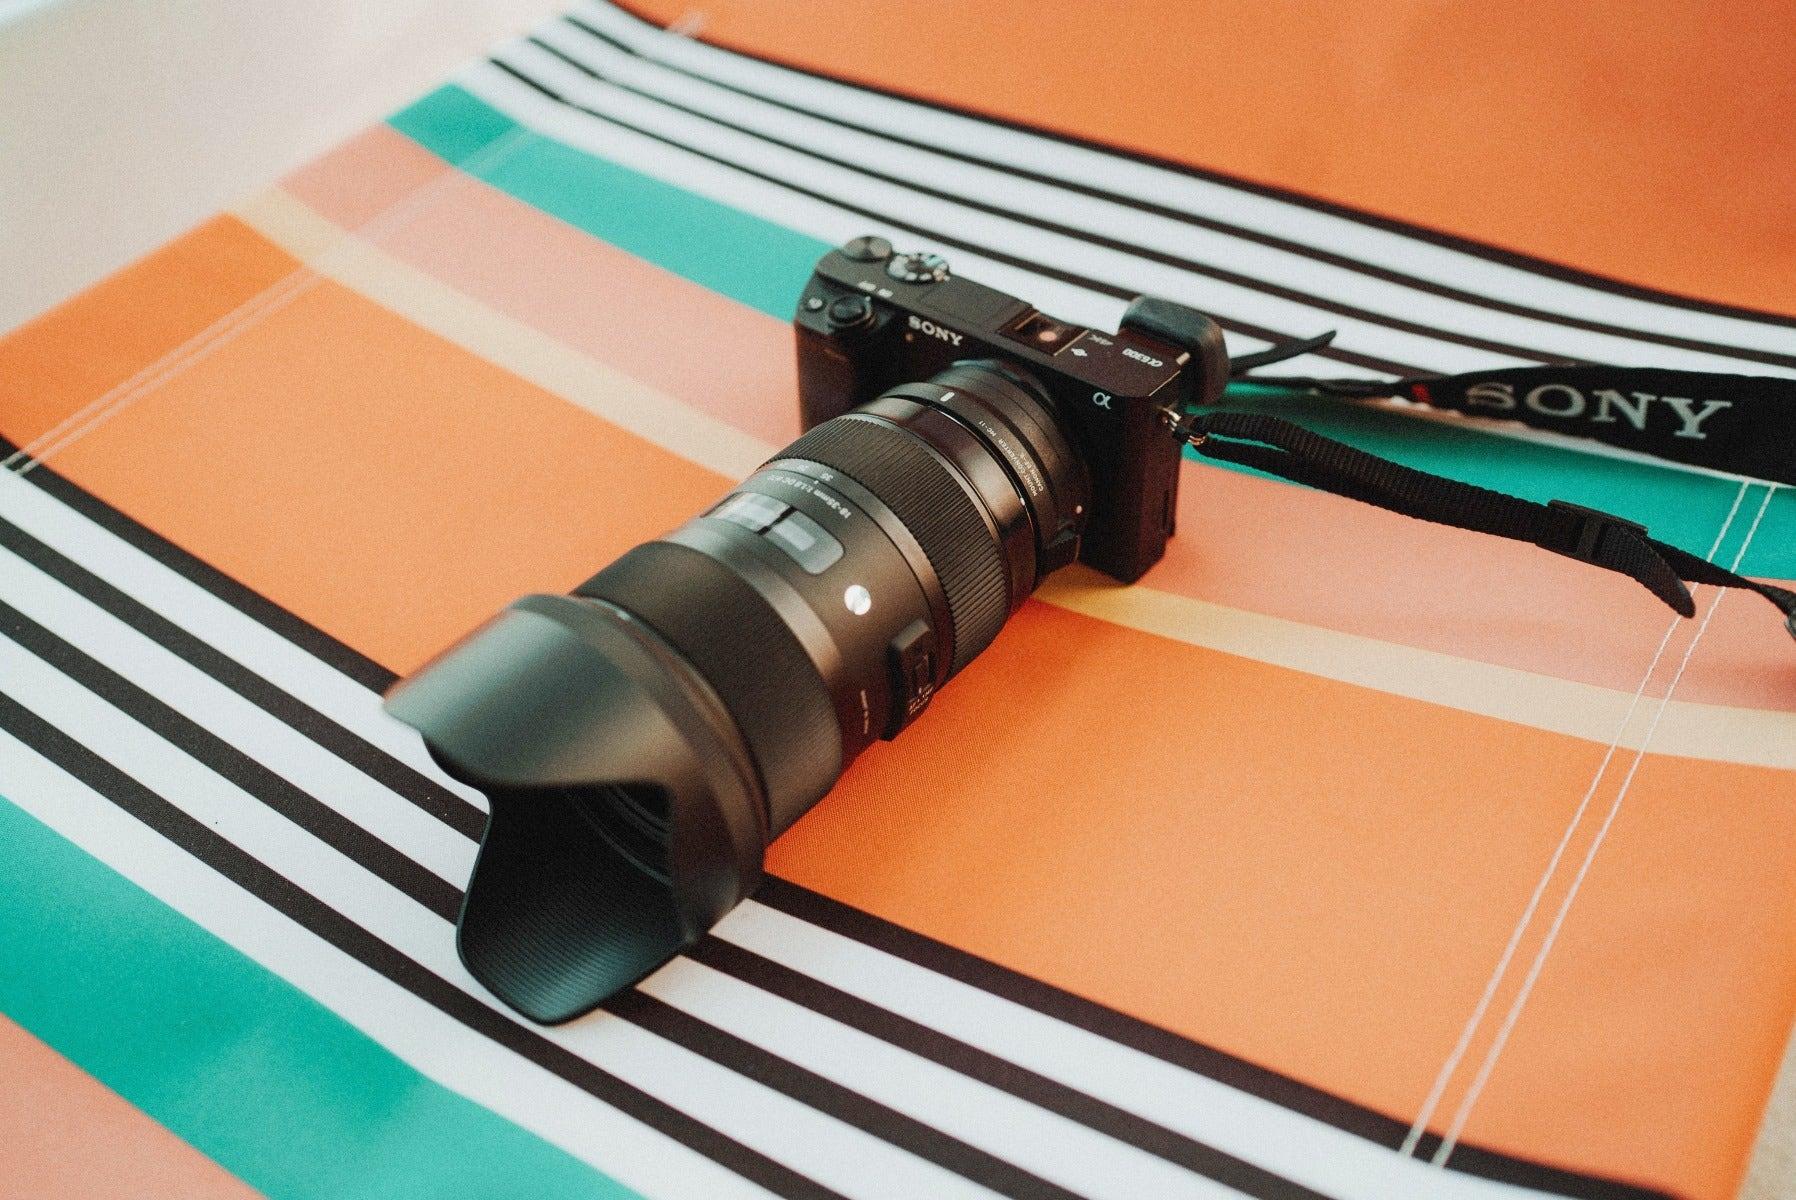 Sigma zoom lens on a Sony camera